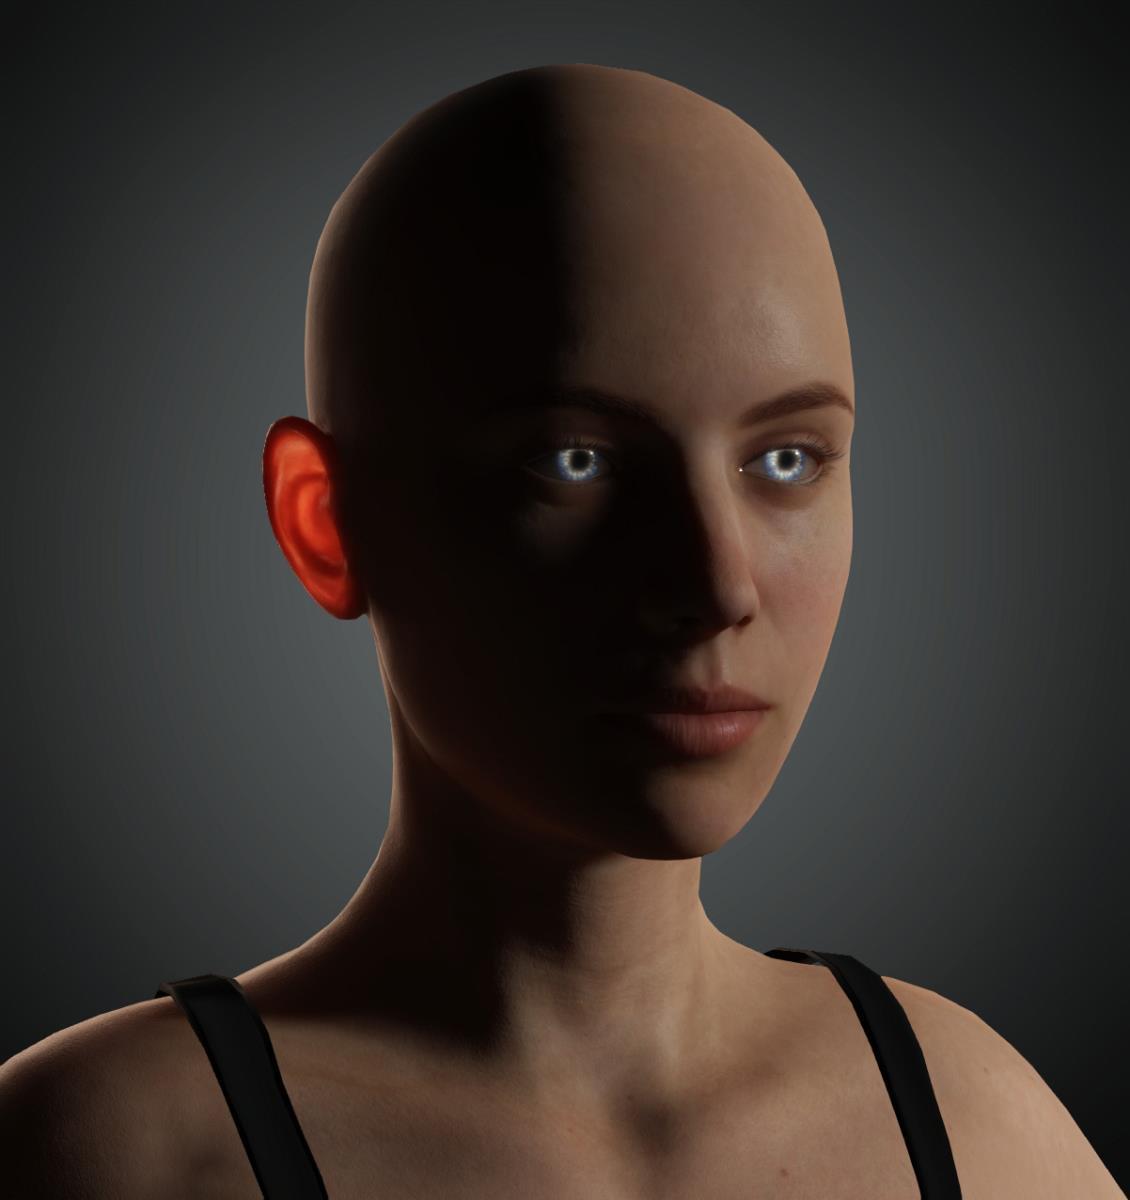 https://forum.reallusion.com/uploads/images/f37c7ba2-8eb9-456c-b40f-c1f4.jpg